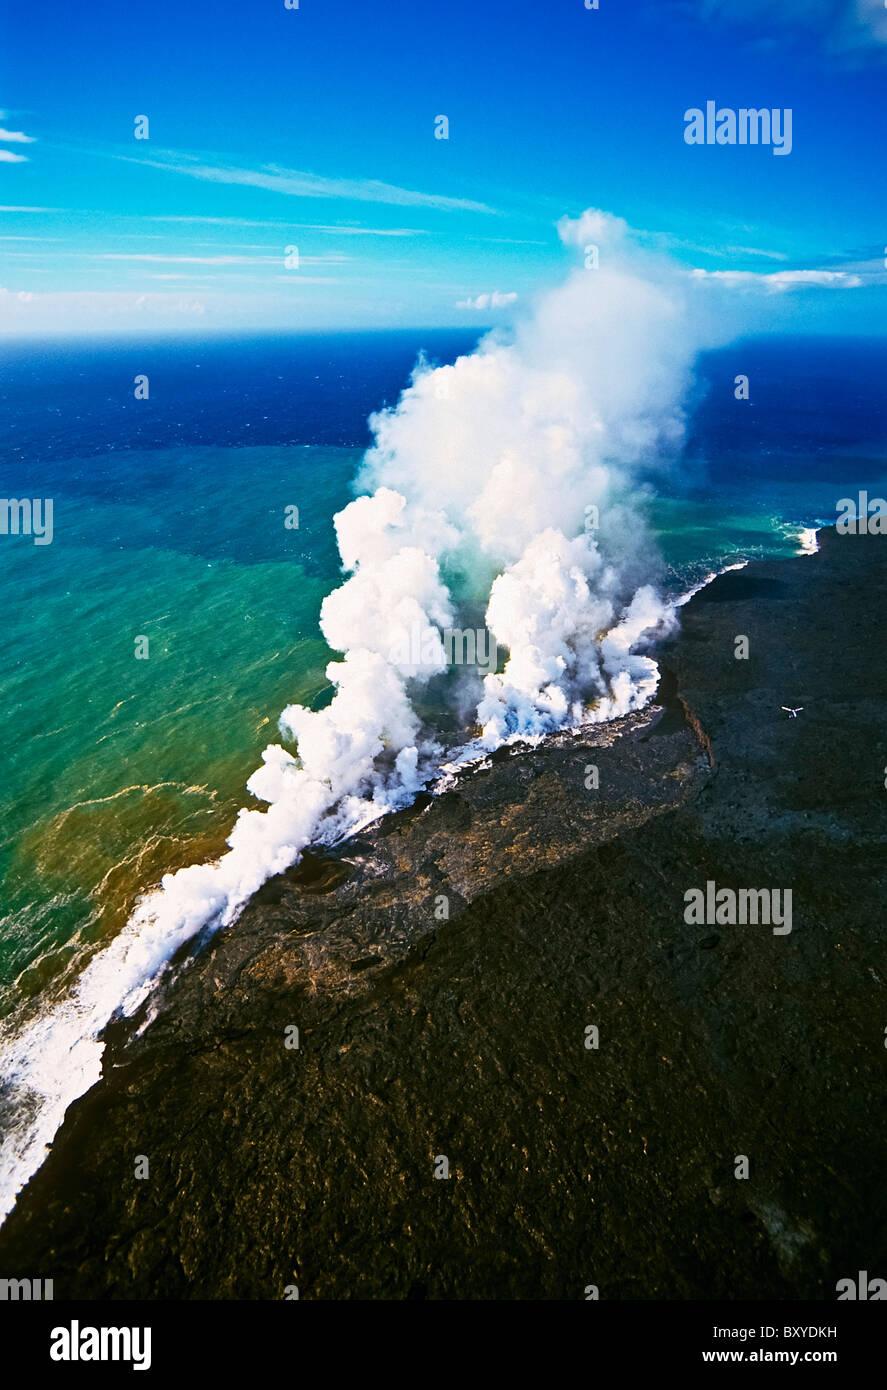 Geschmolzener Lava tritt kalten Ozean, Kilauea-Vulkan, Big Island, Hawaii, USA Stockbild